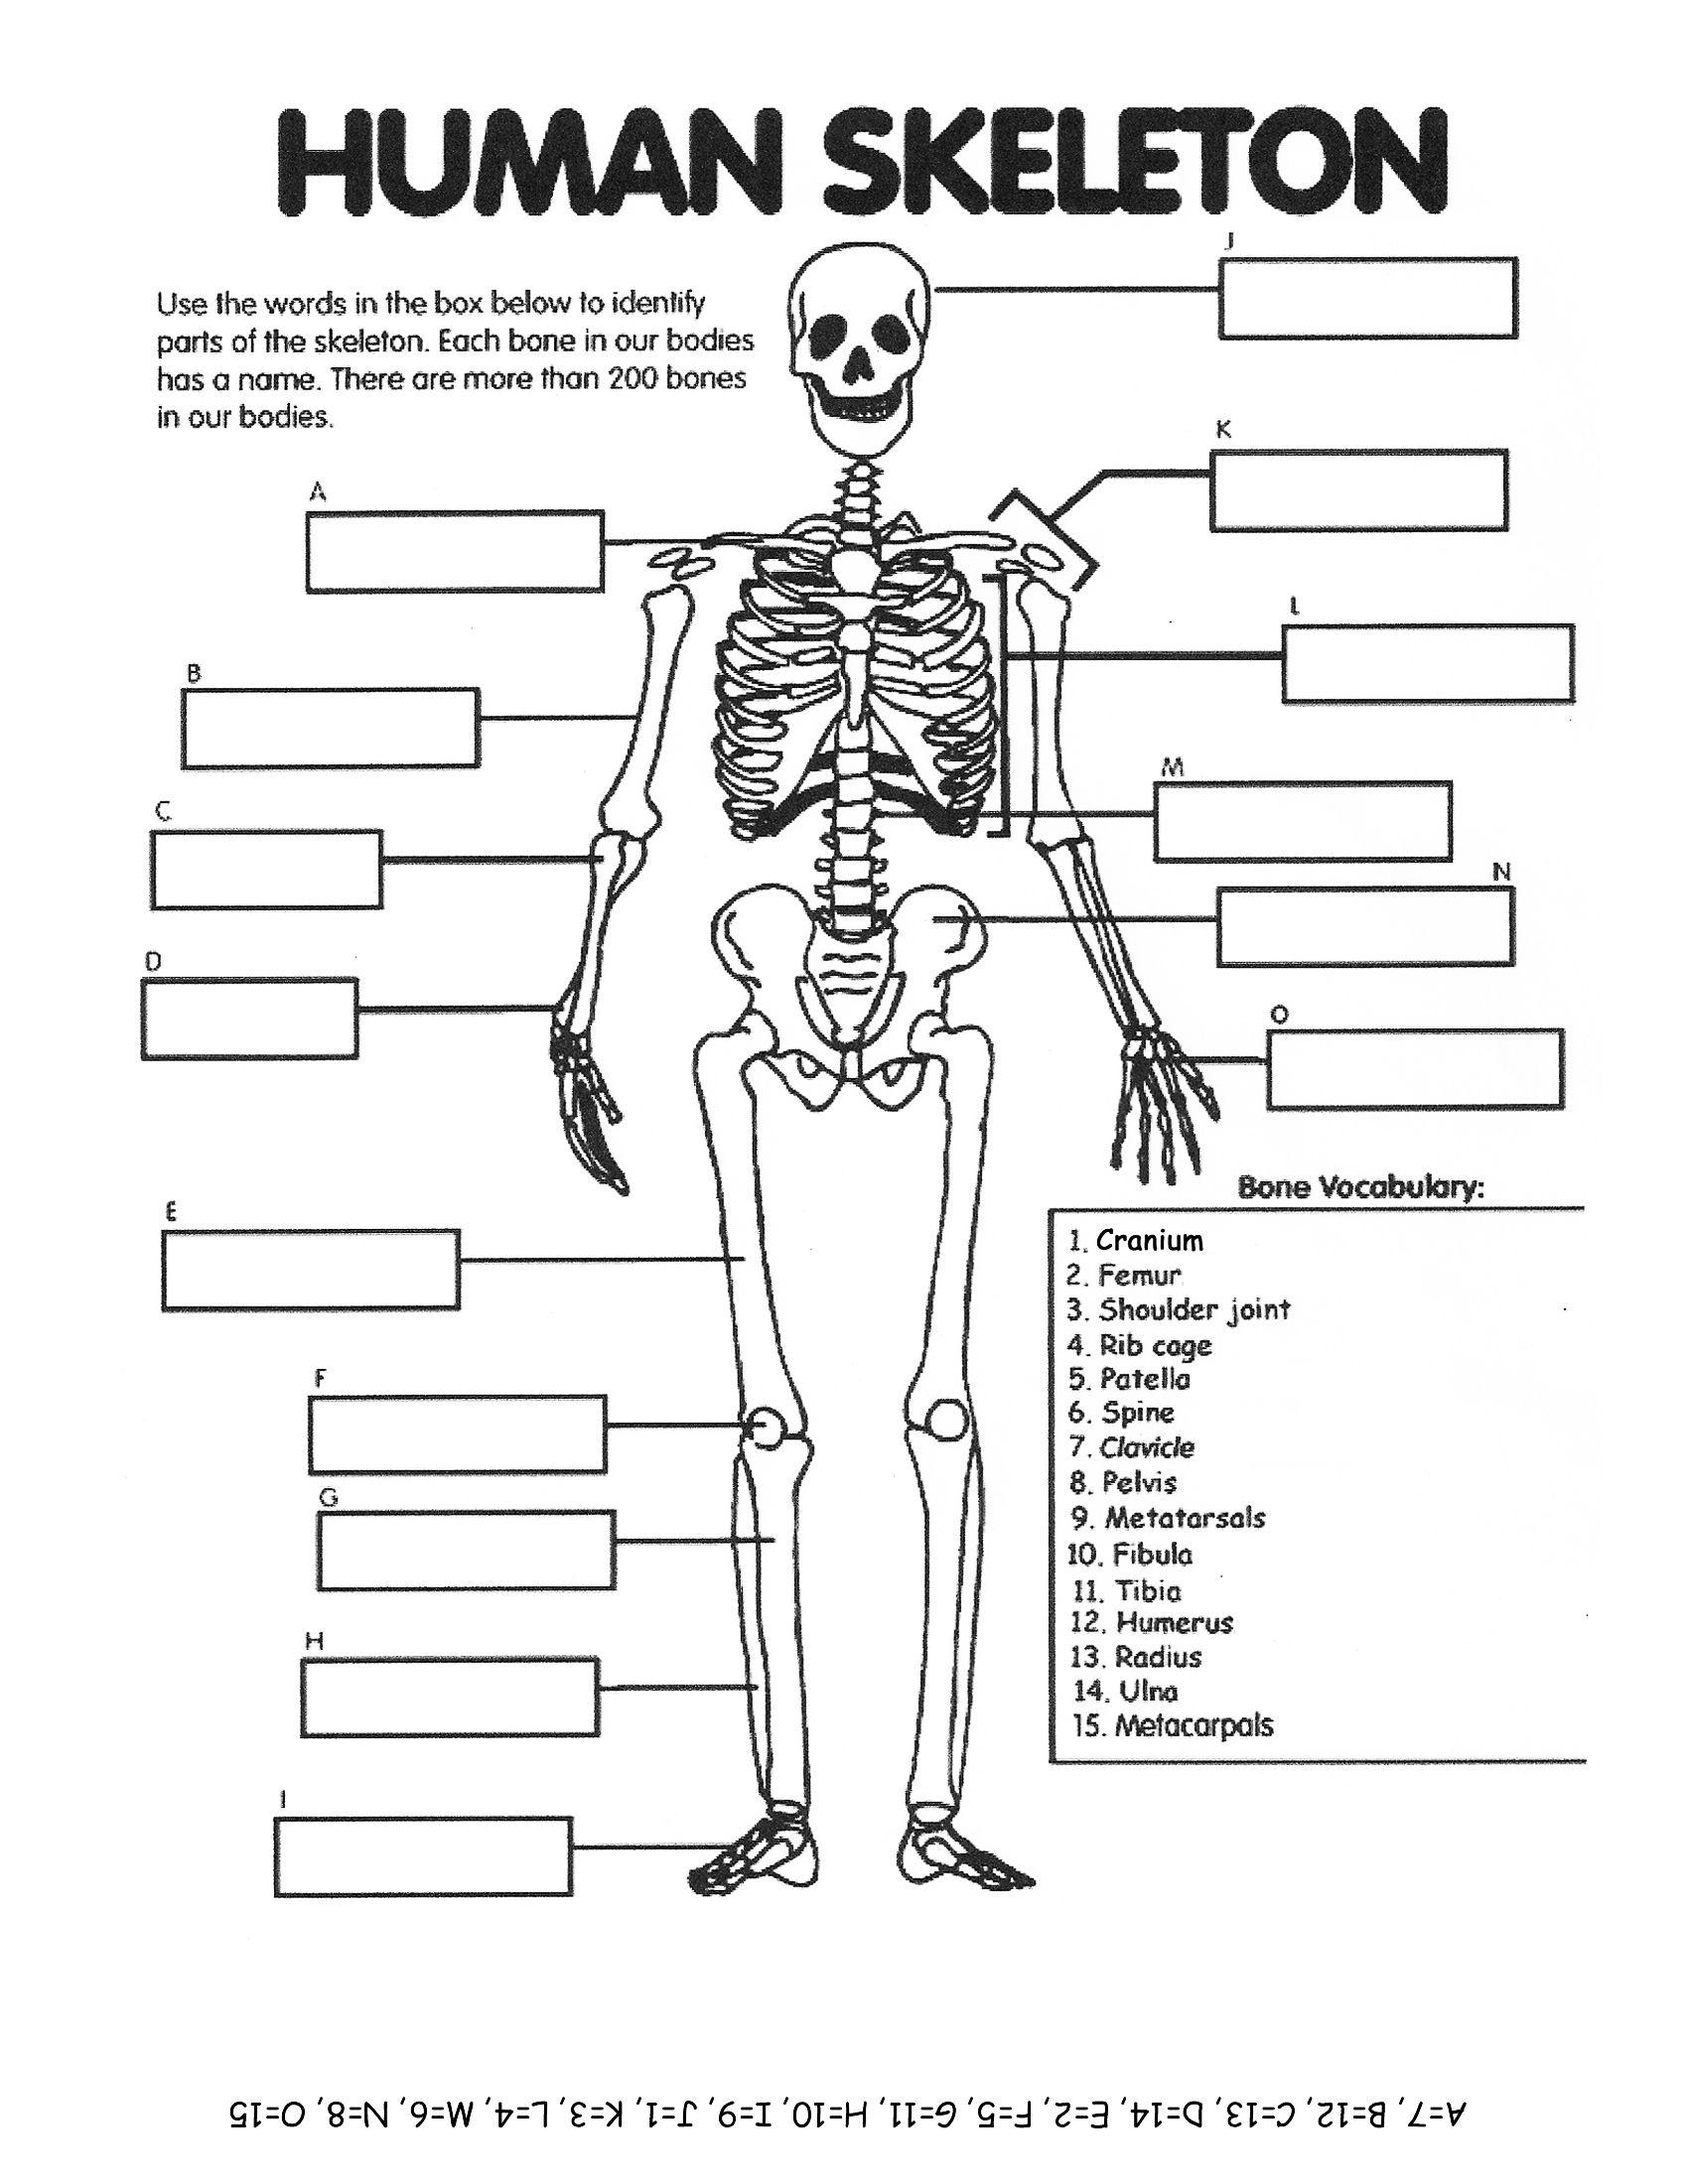 worksheet Human Skeleton Worksheet no link human skeleton elementary worksheet homeschool health worksheet